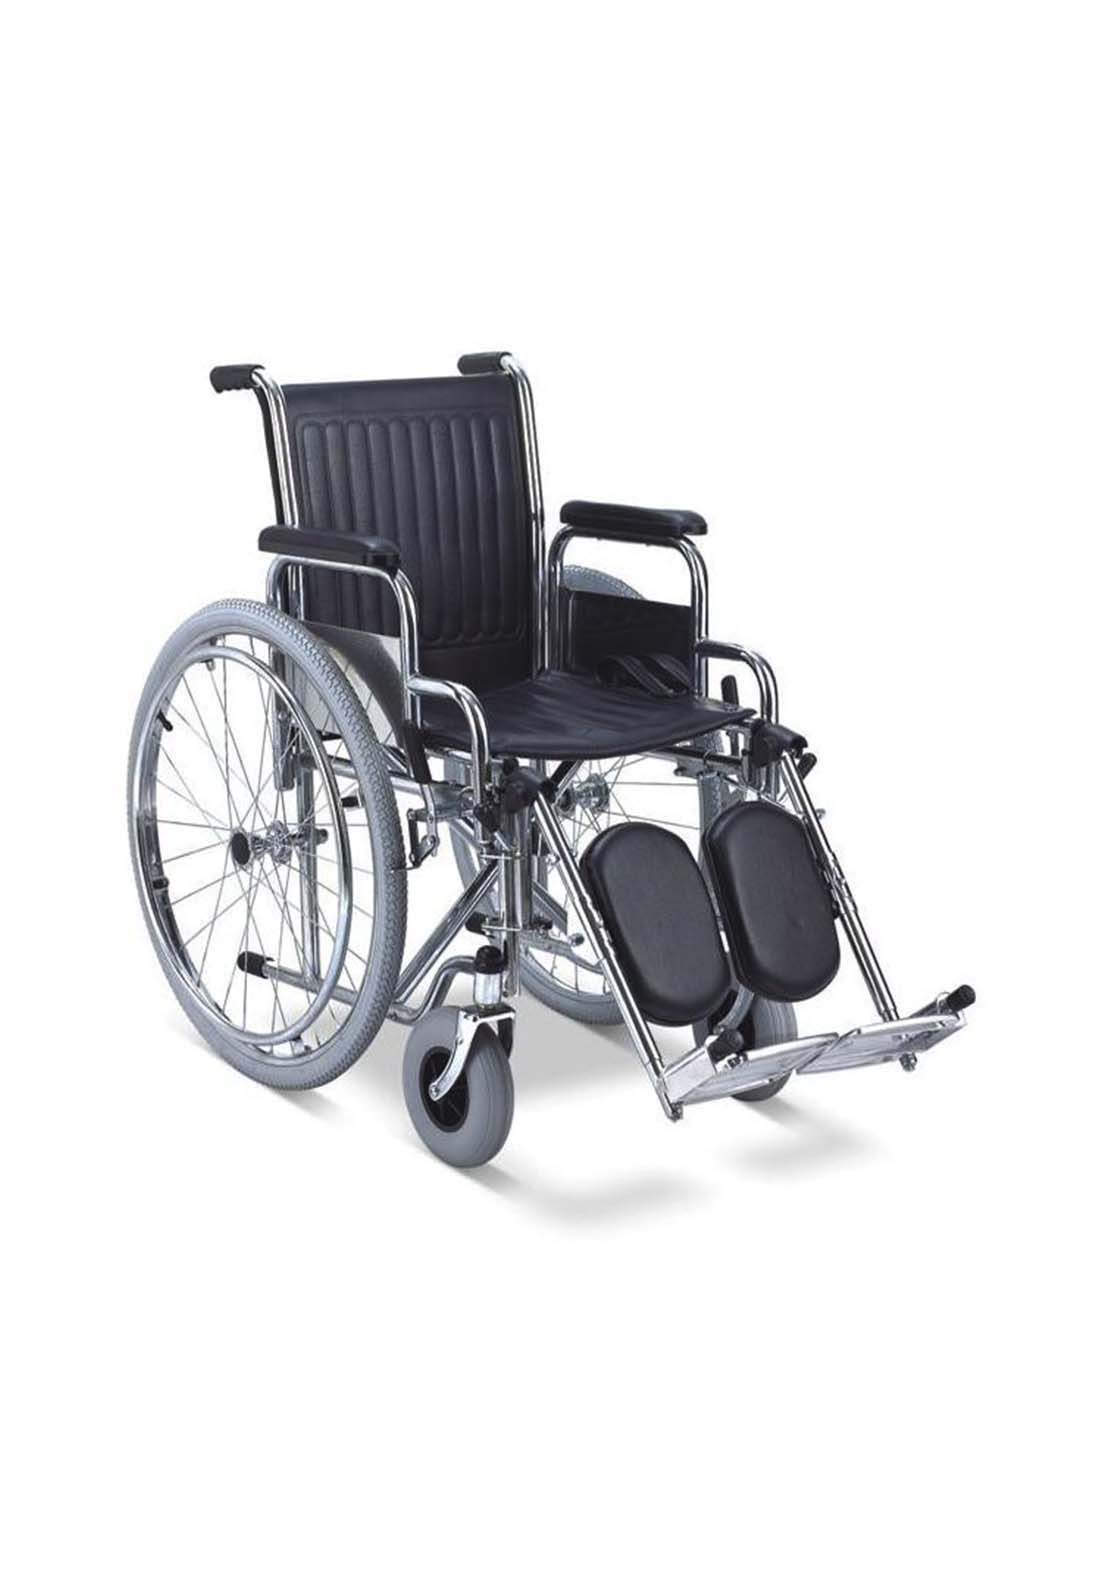 Foshan Fs902 Wheel Chair 1 Pc كريم متحرك